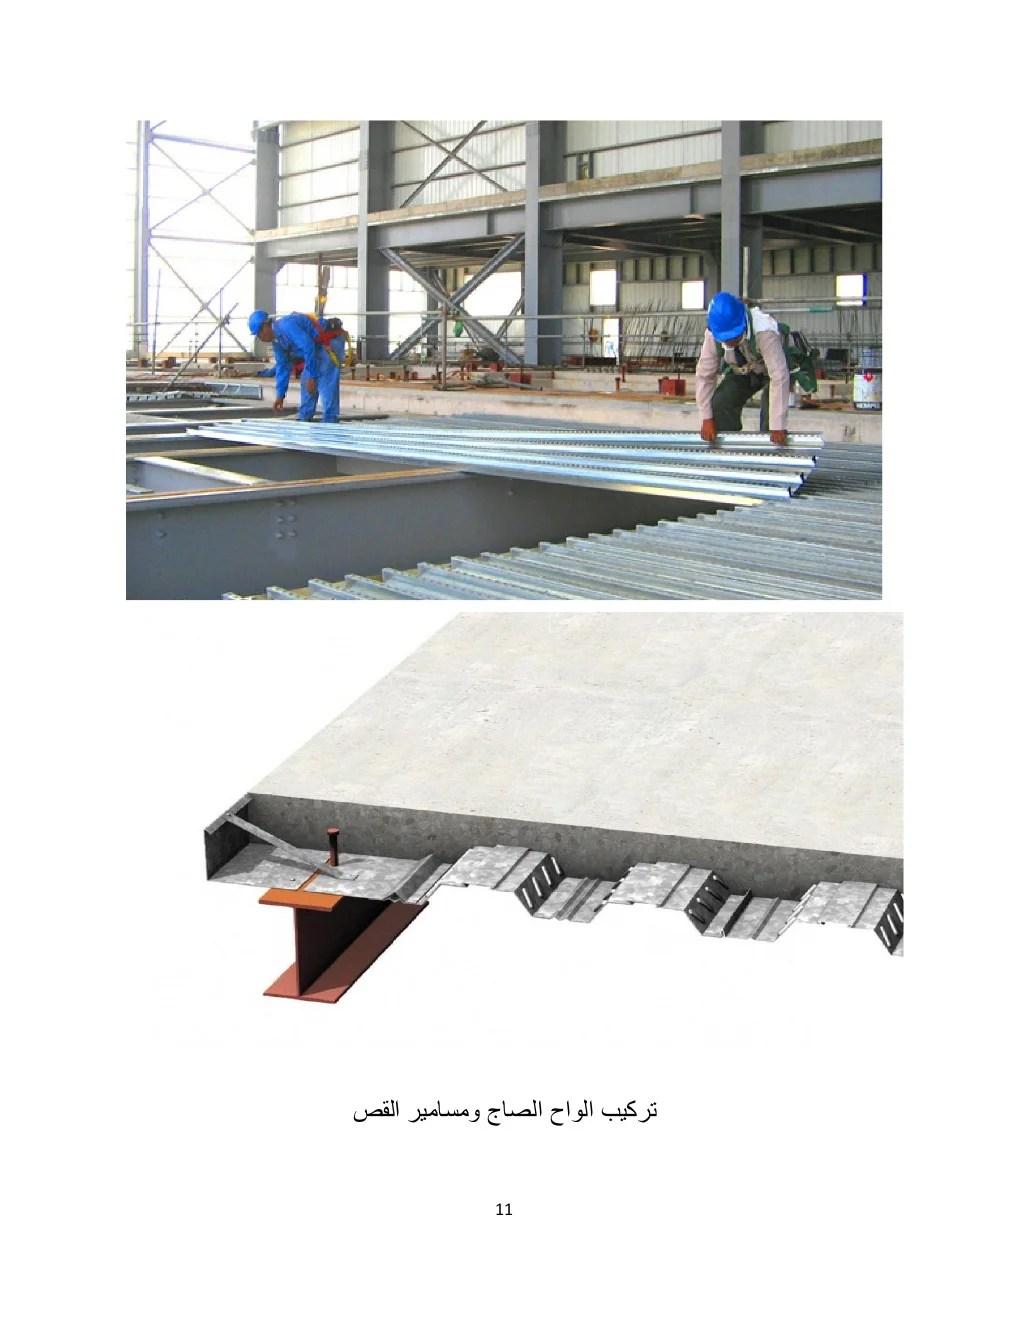 seismic-design-of-composite-shear-walls-frames-11-1024.jpg